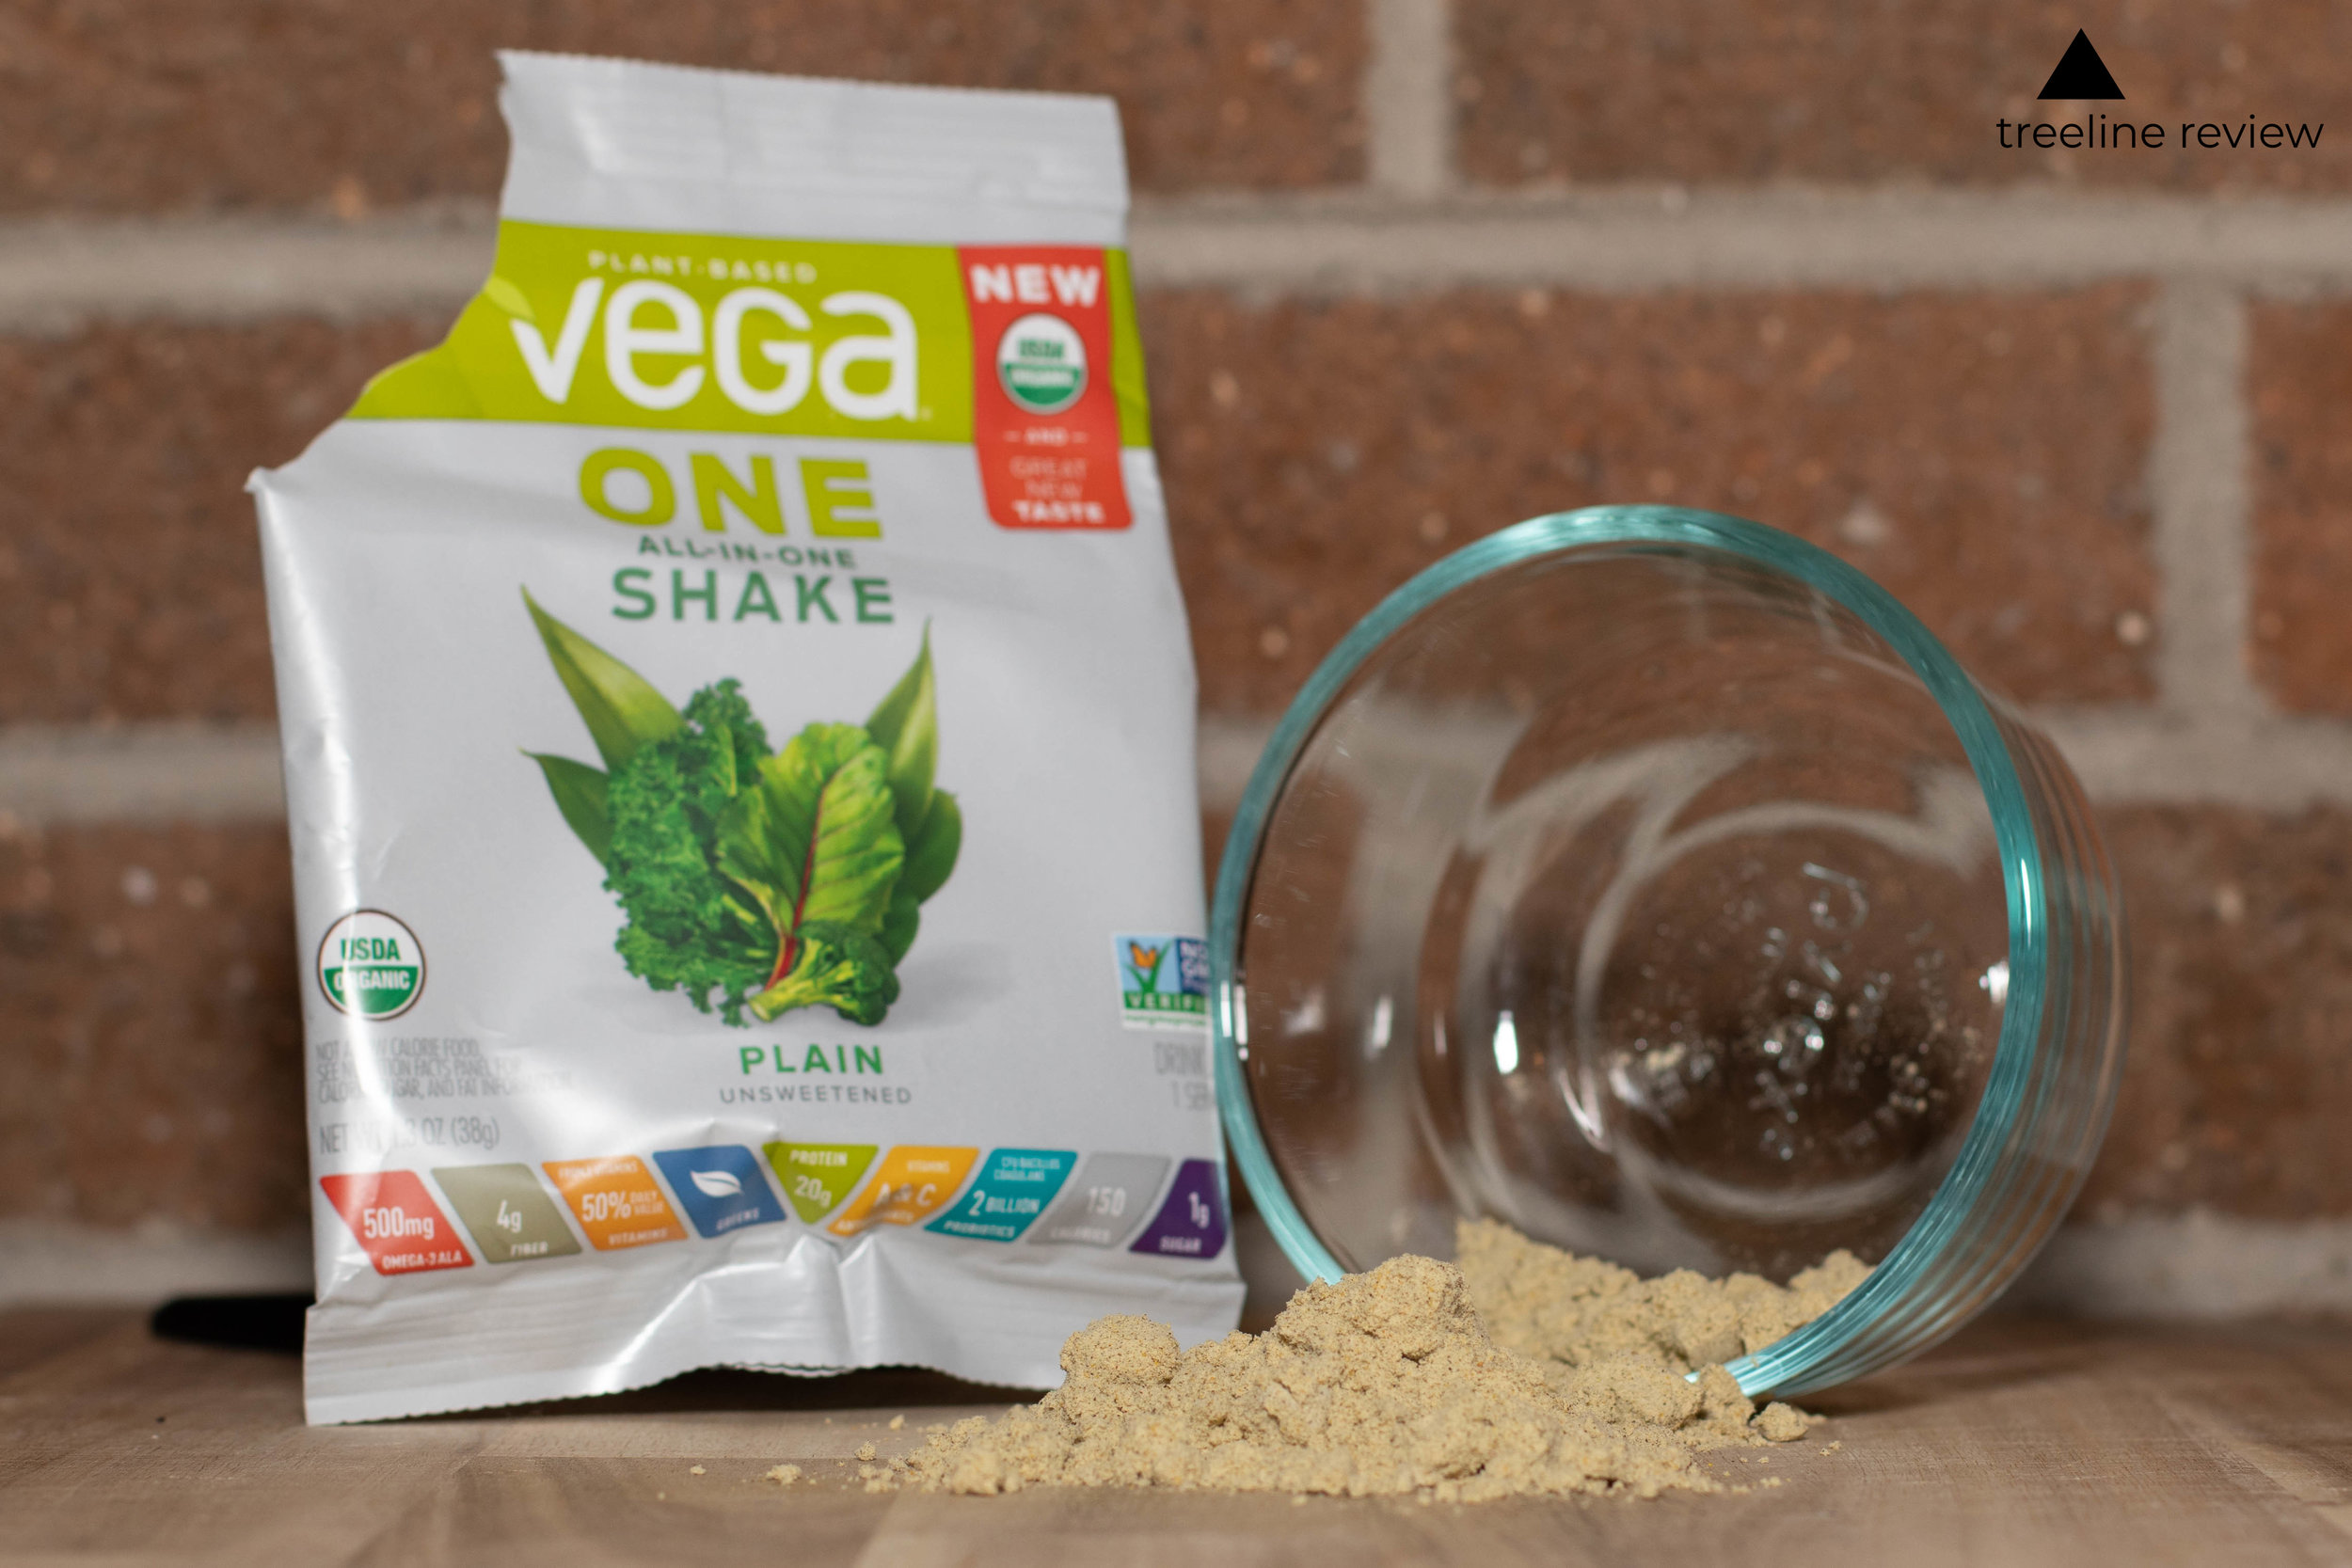 The Best Budget Vegan Protein Powder - Vega OneRead more →